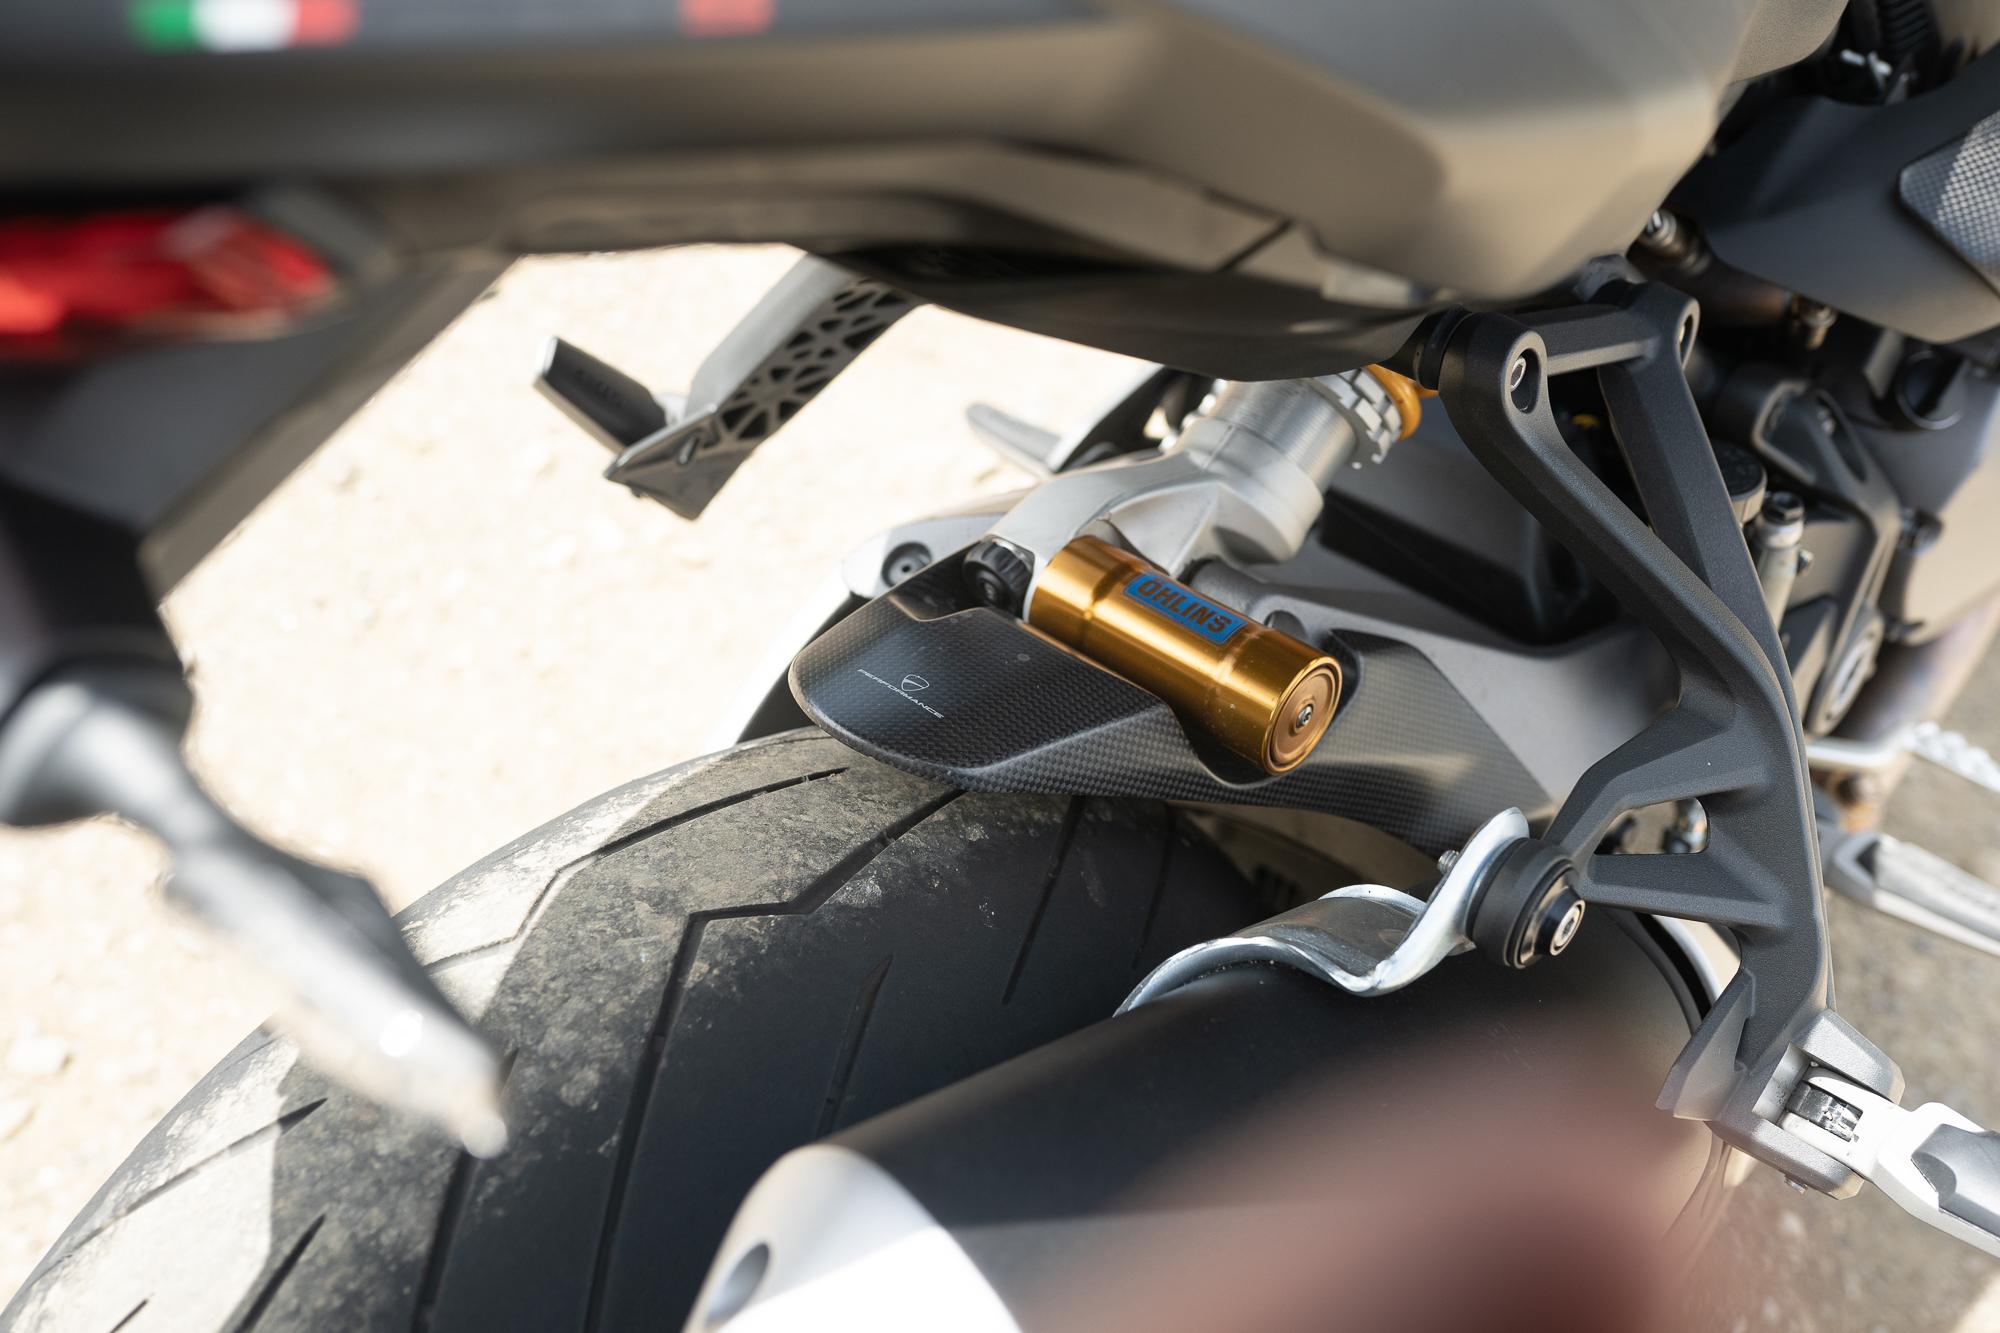 2021 Ducati Monster 1200 S rear suspension detail